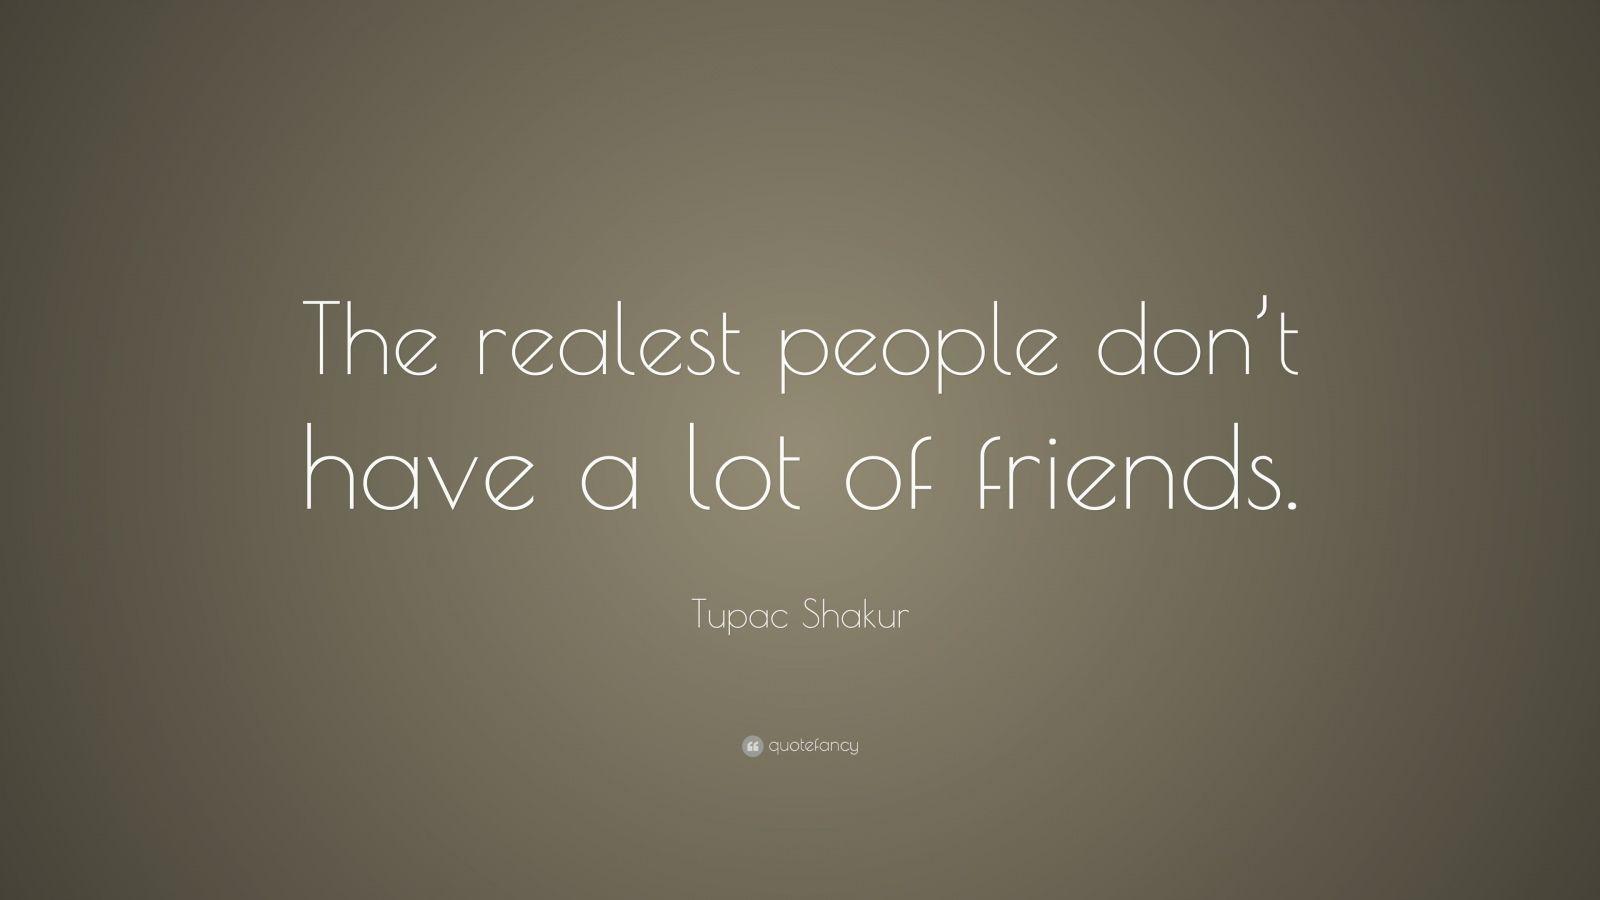 Rap Quotes About Friends. Rap Quotes About Friends Perfect ...